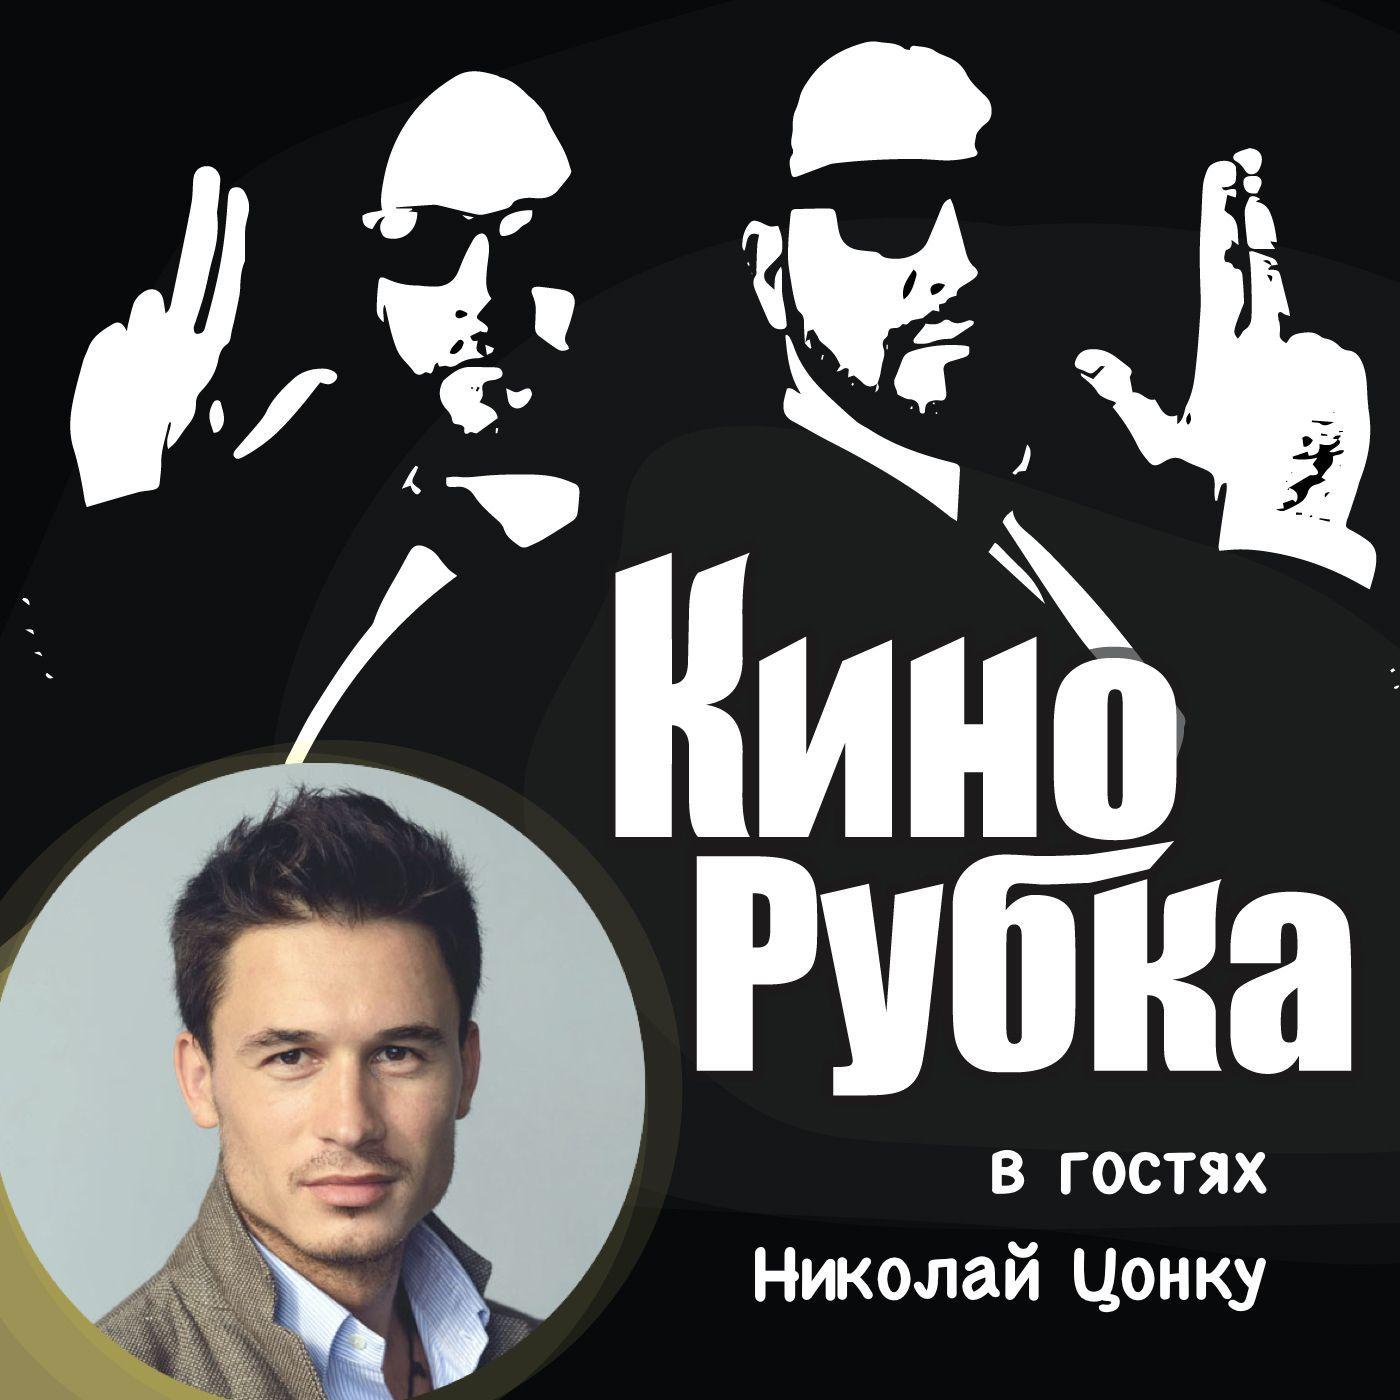 Павел Дикан Актер театра и кино Николай Цонку павел дикан актер театра и кино николай цонку